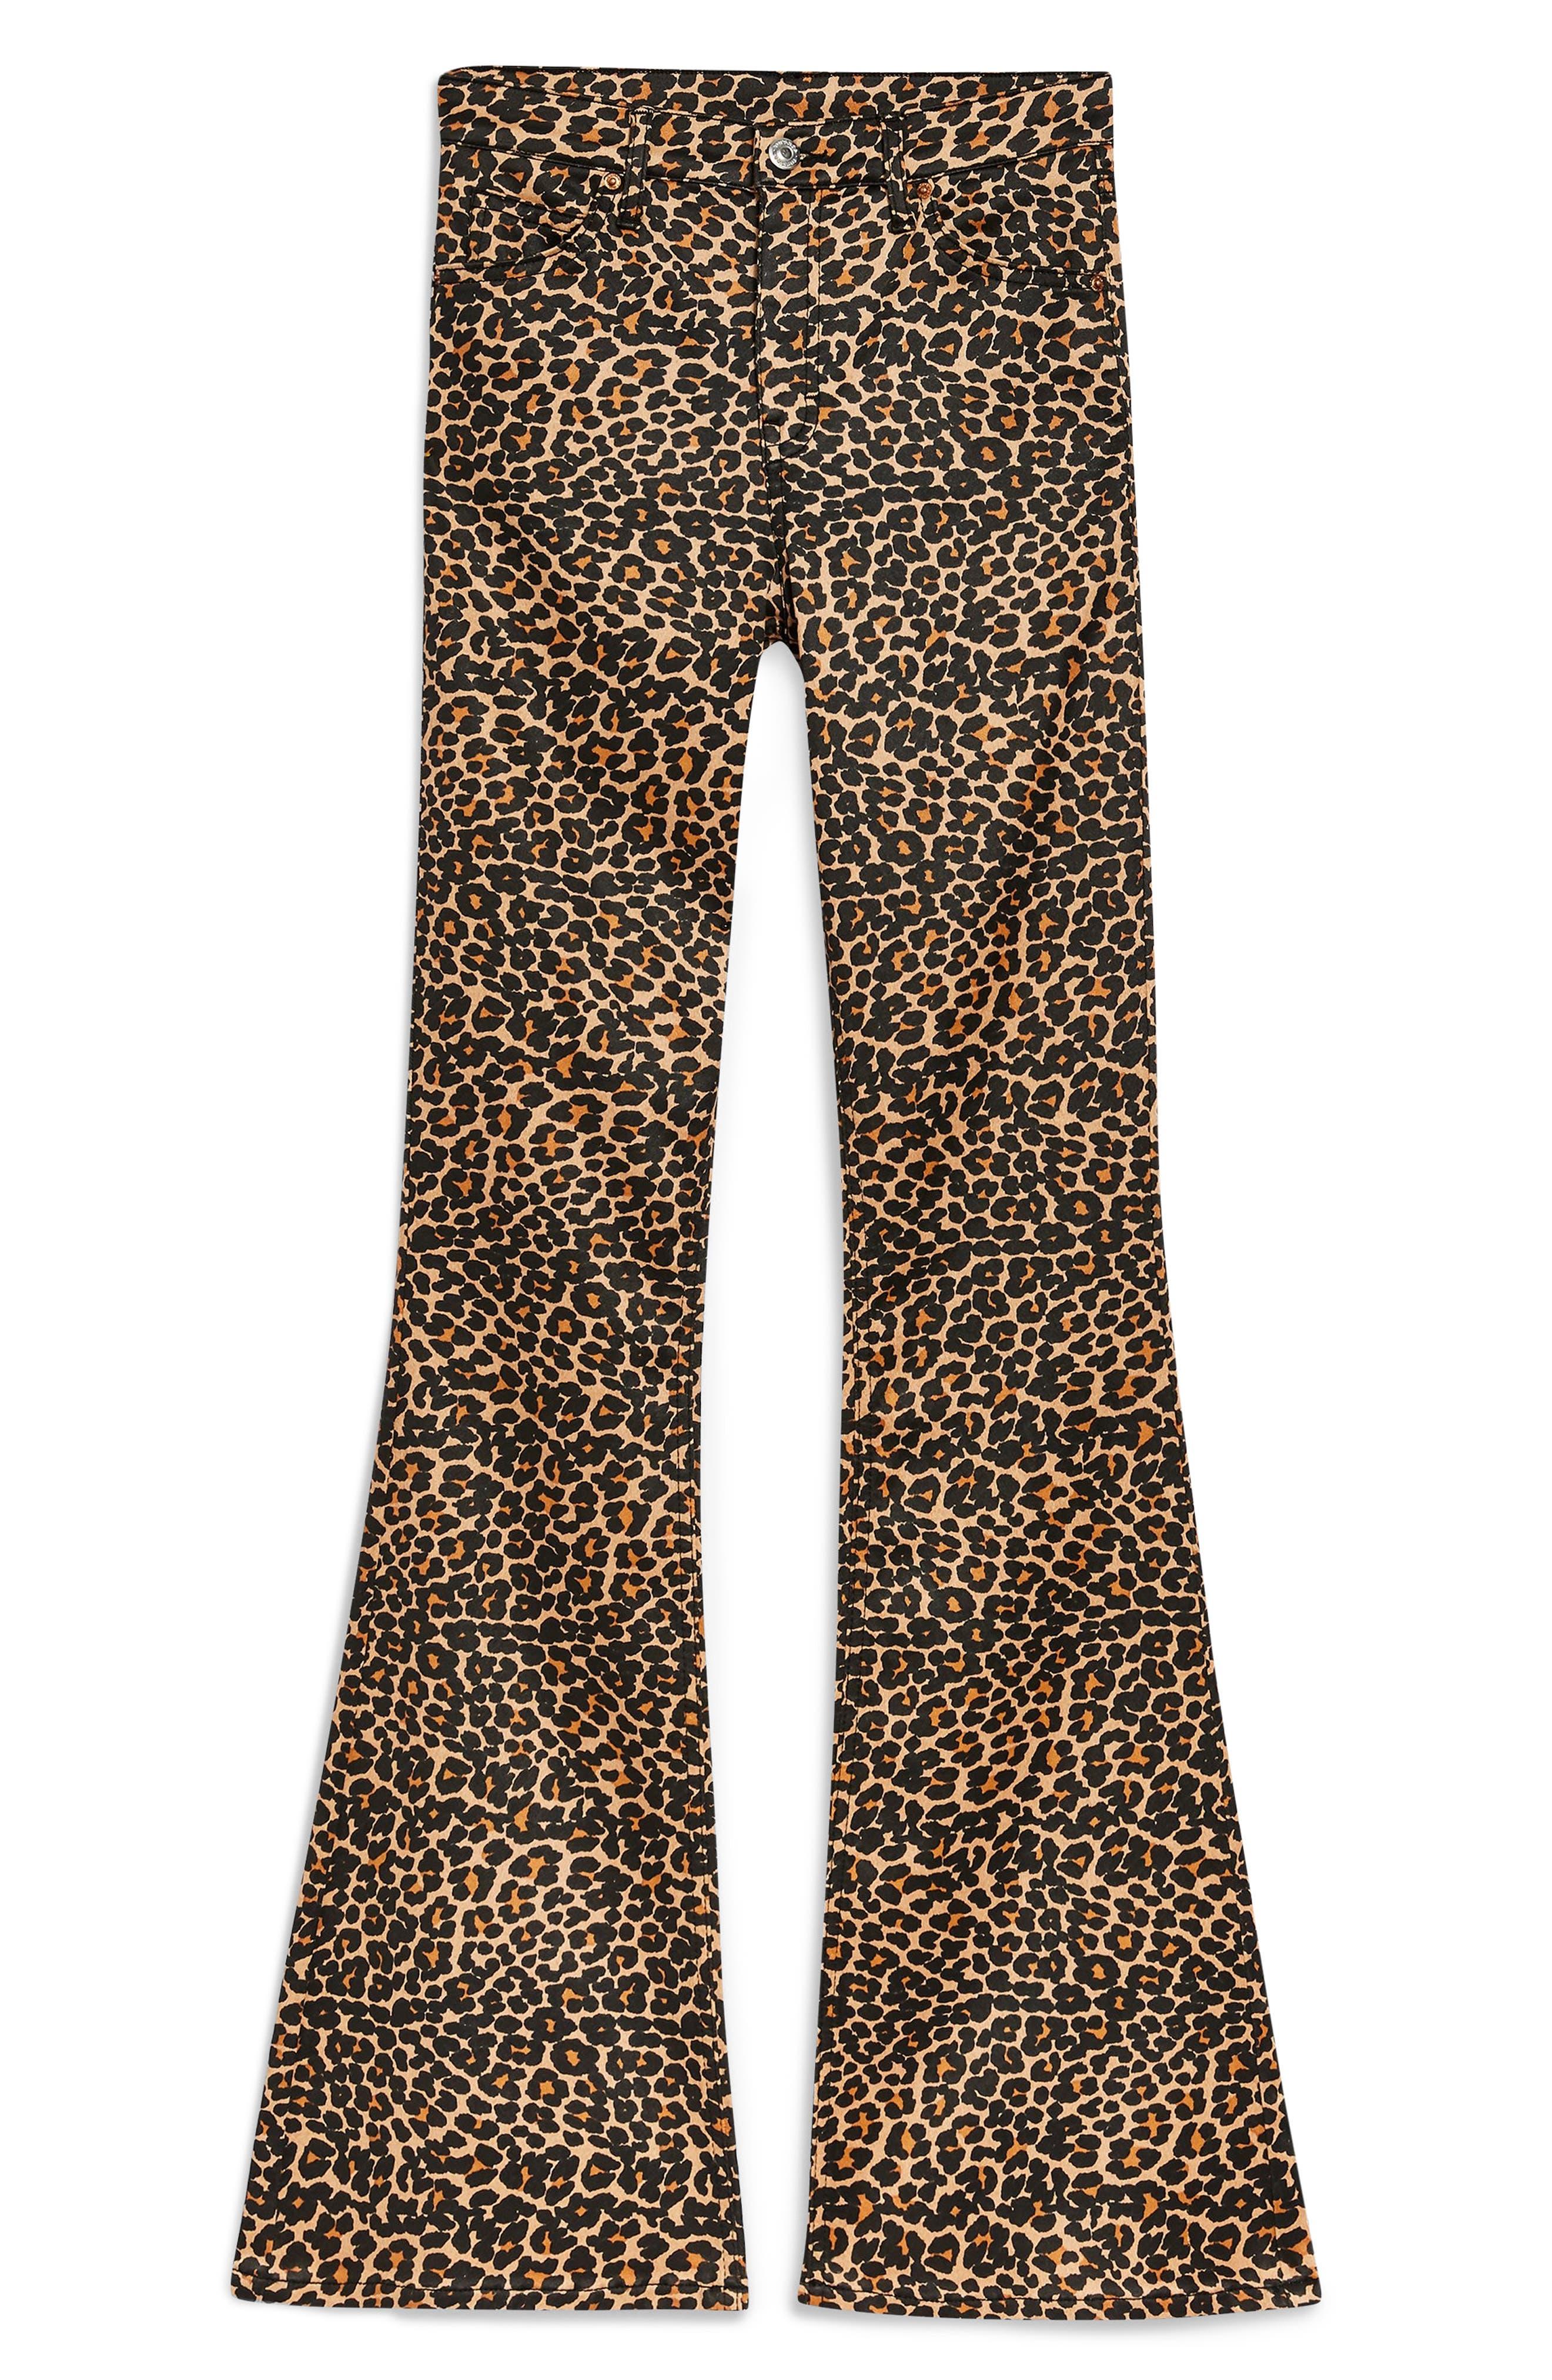 TOPSHOP, MOTO Leopard Print Flare Jeans, Alternate thumbnail 4, color, 200